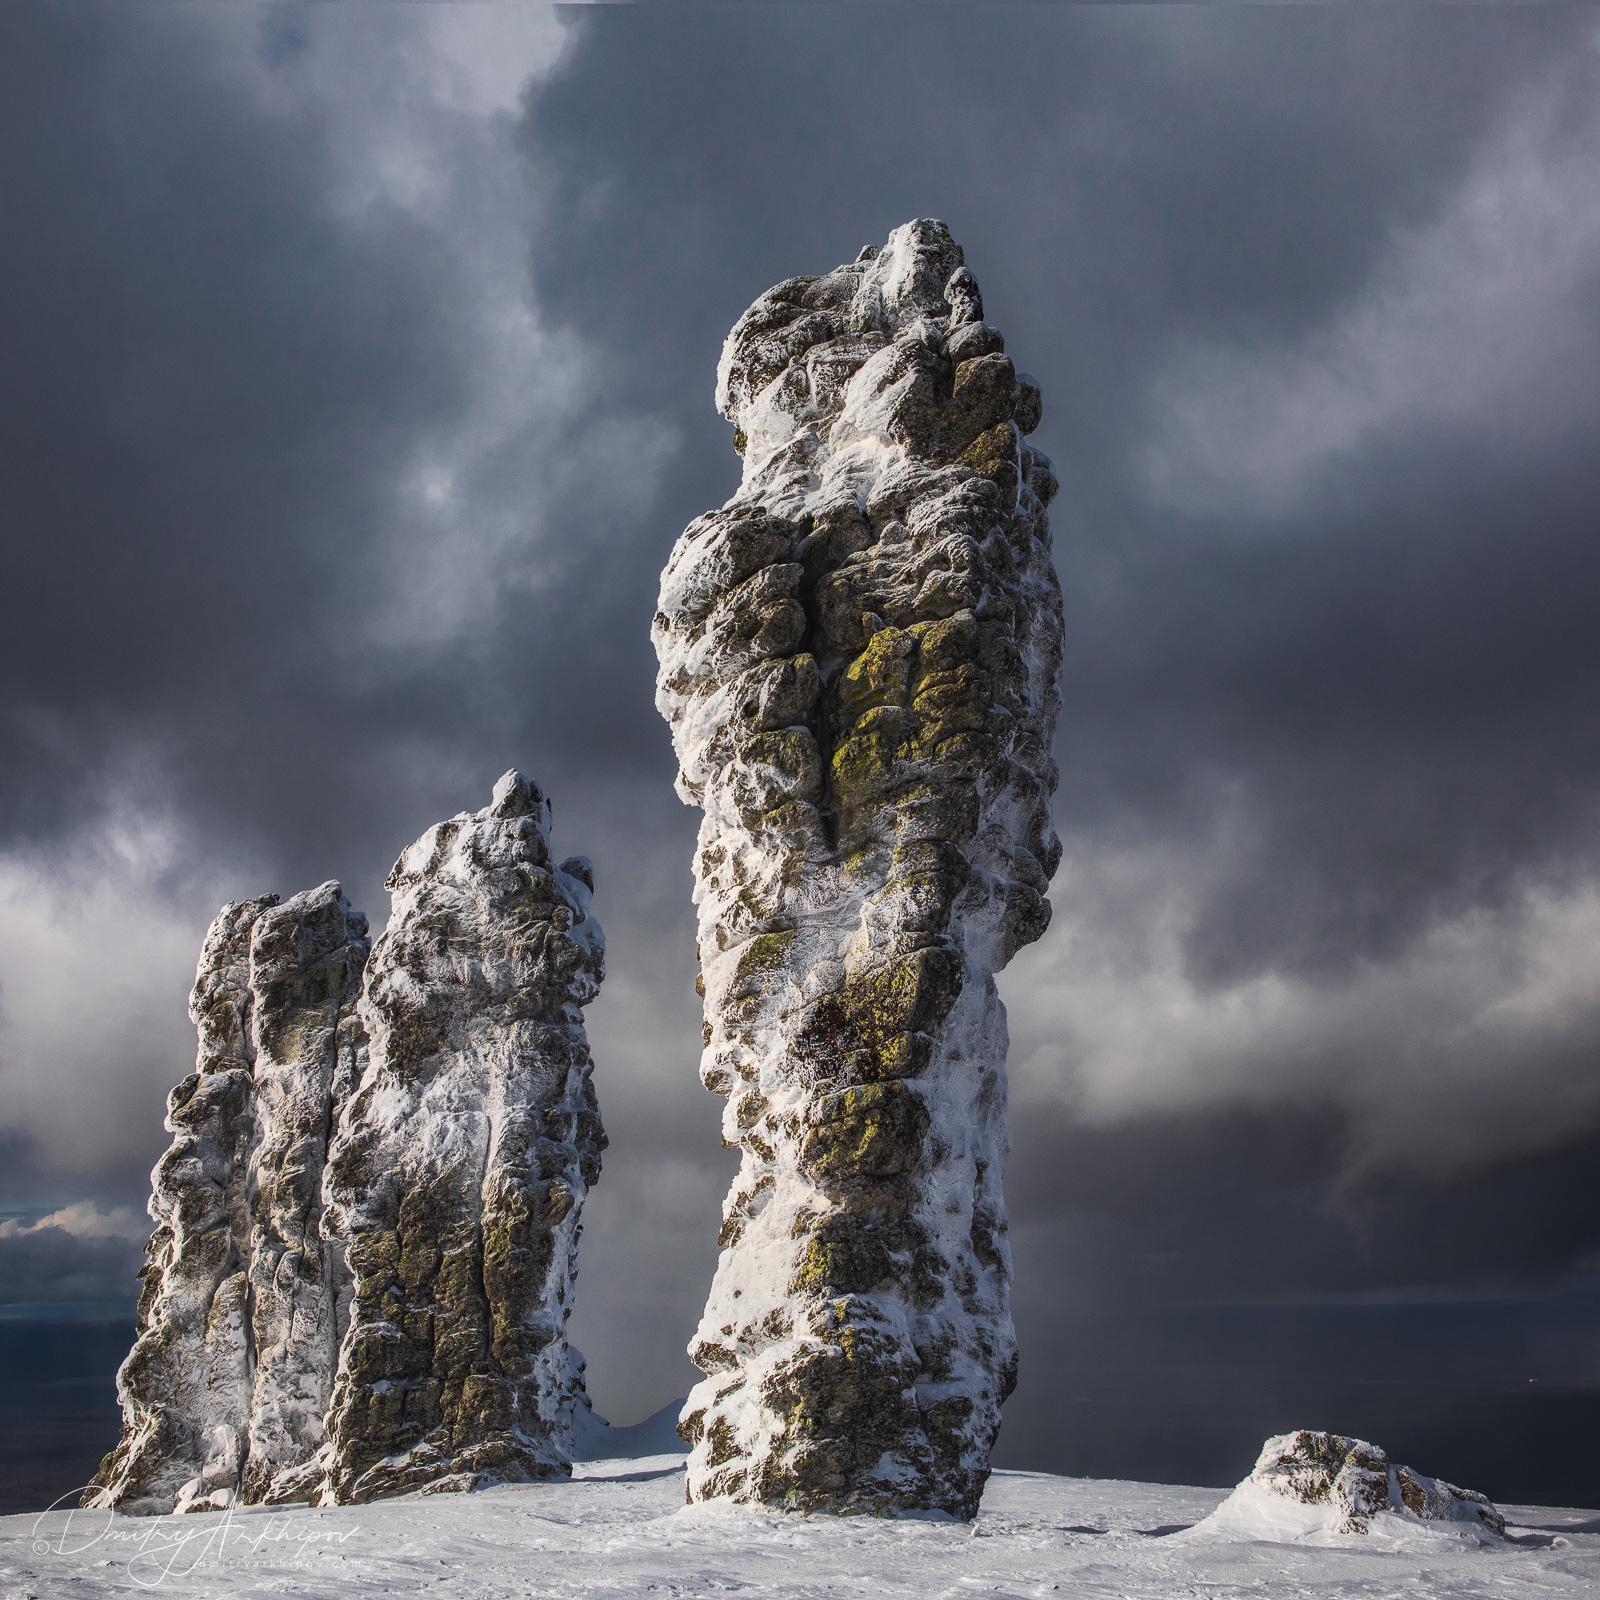 Уникальное плато Маньпупунёр